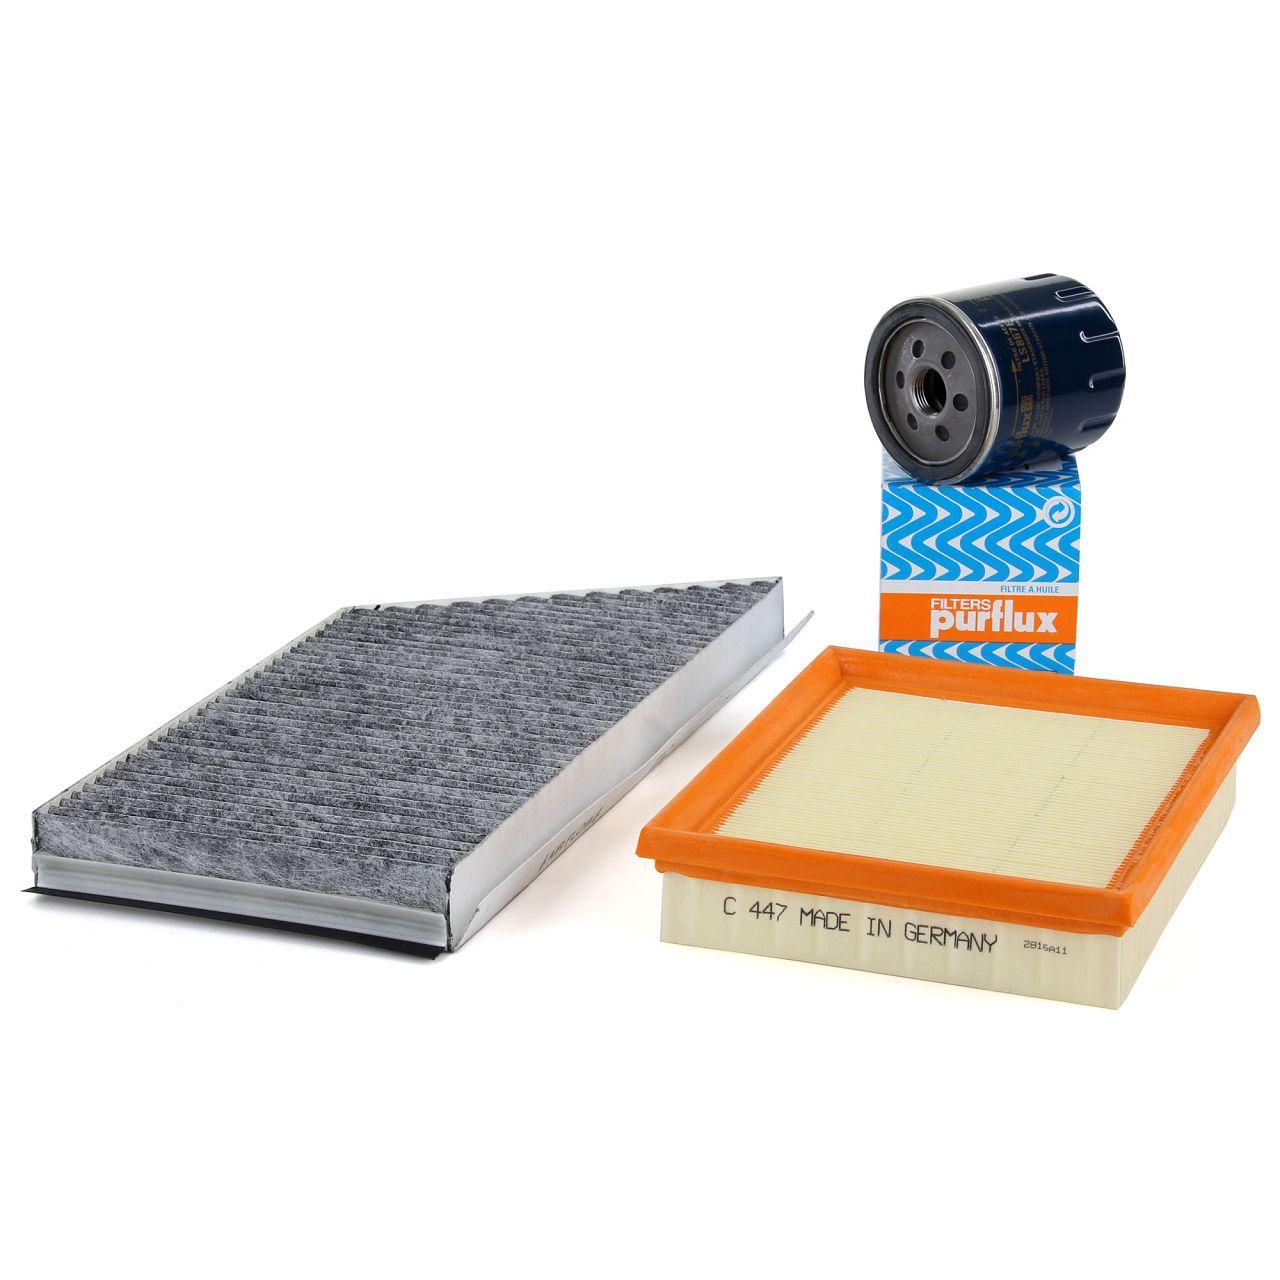 Inspektionskit Filterpaket Filterset für PEUGEOT 206 Schrägheck 1.1i 1.4i 1.6i